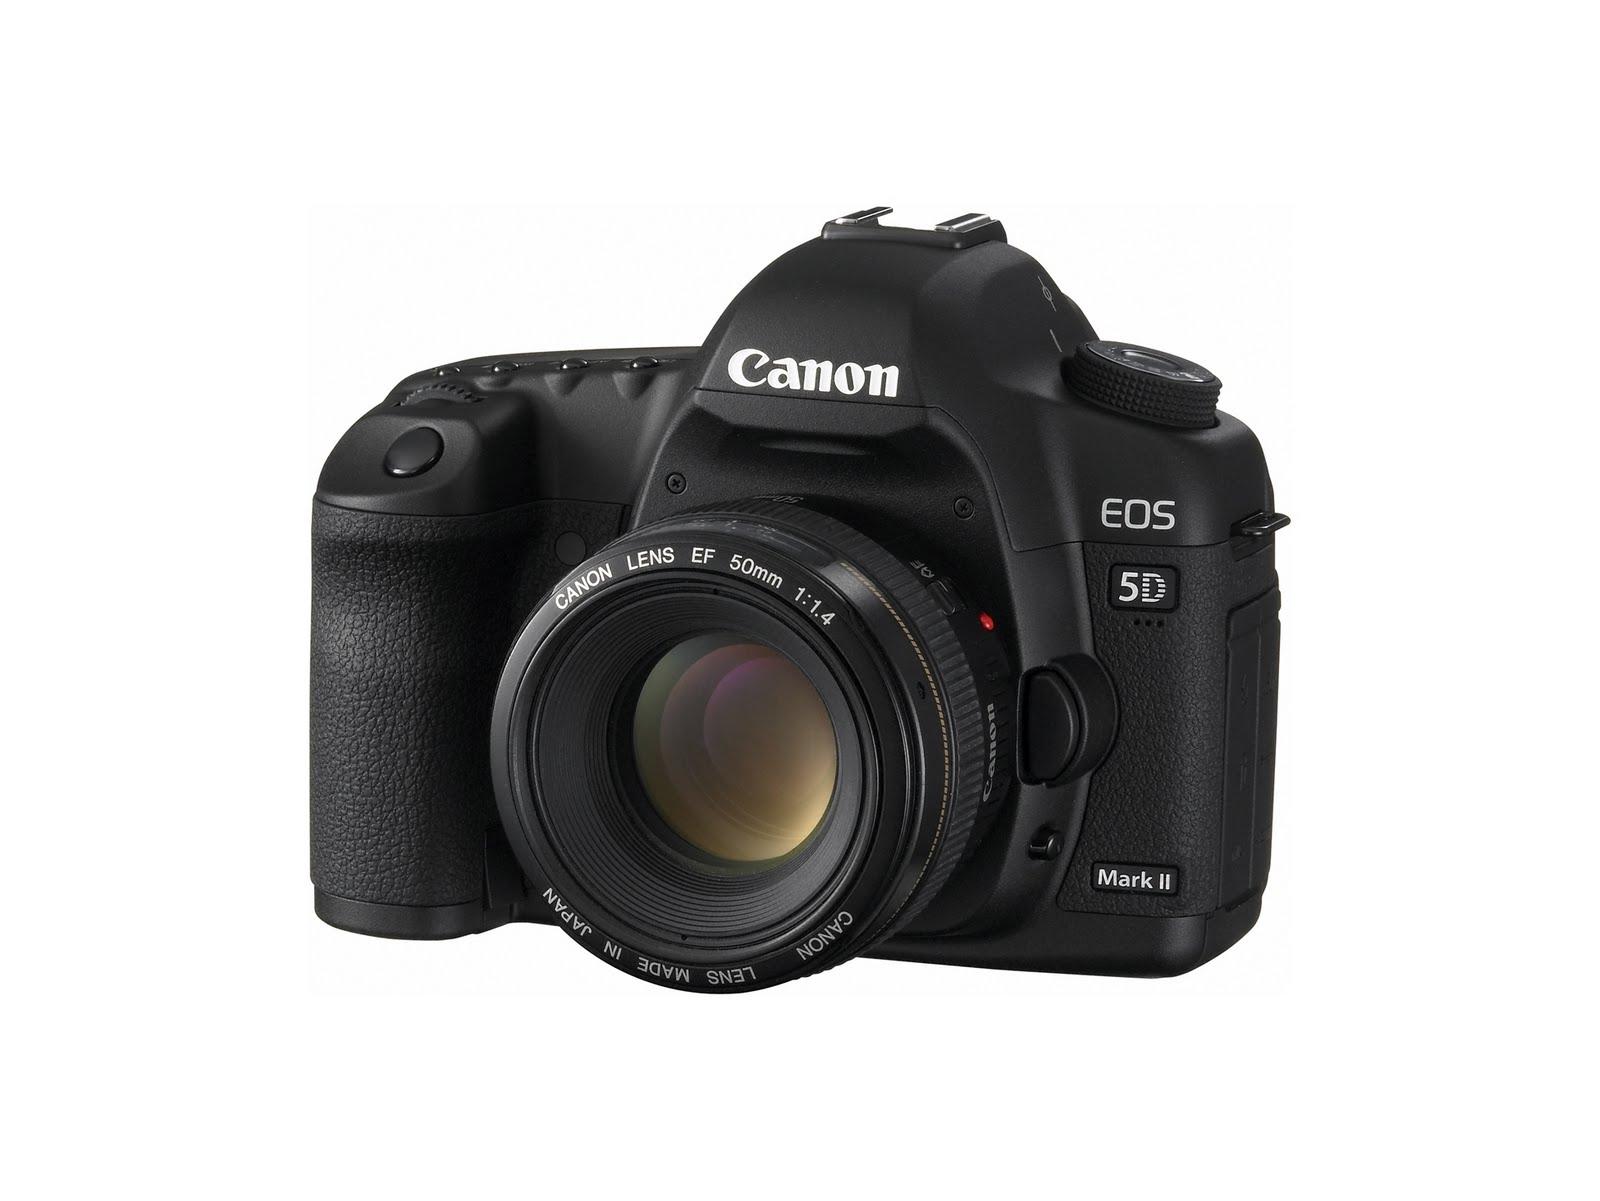 canon eos 5d mark ii dslr camera technical specs. Black Bedroom Furniture Sets. Home Design Ideas